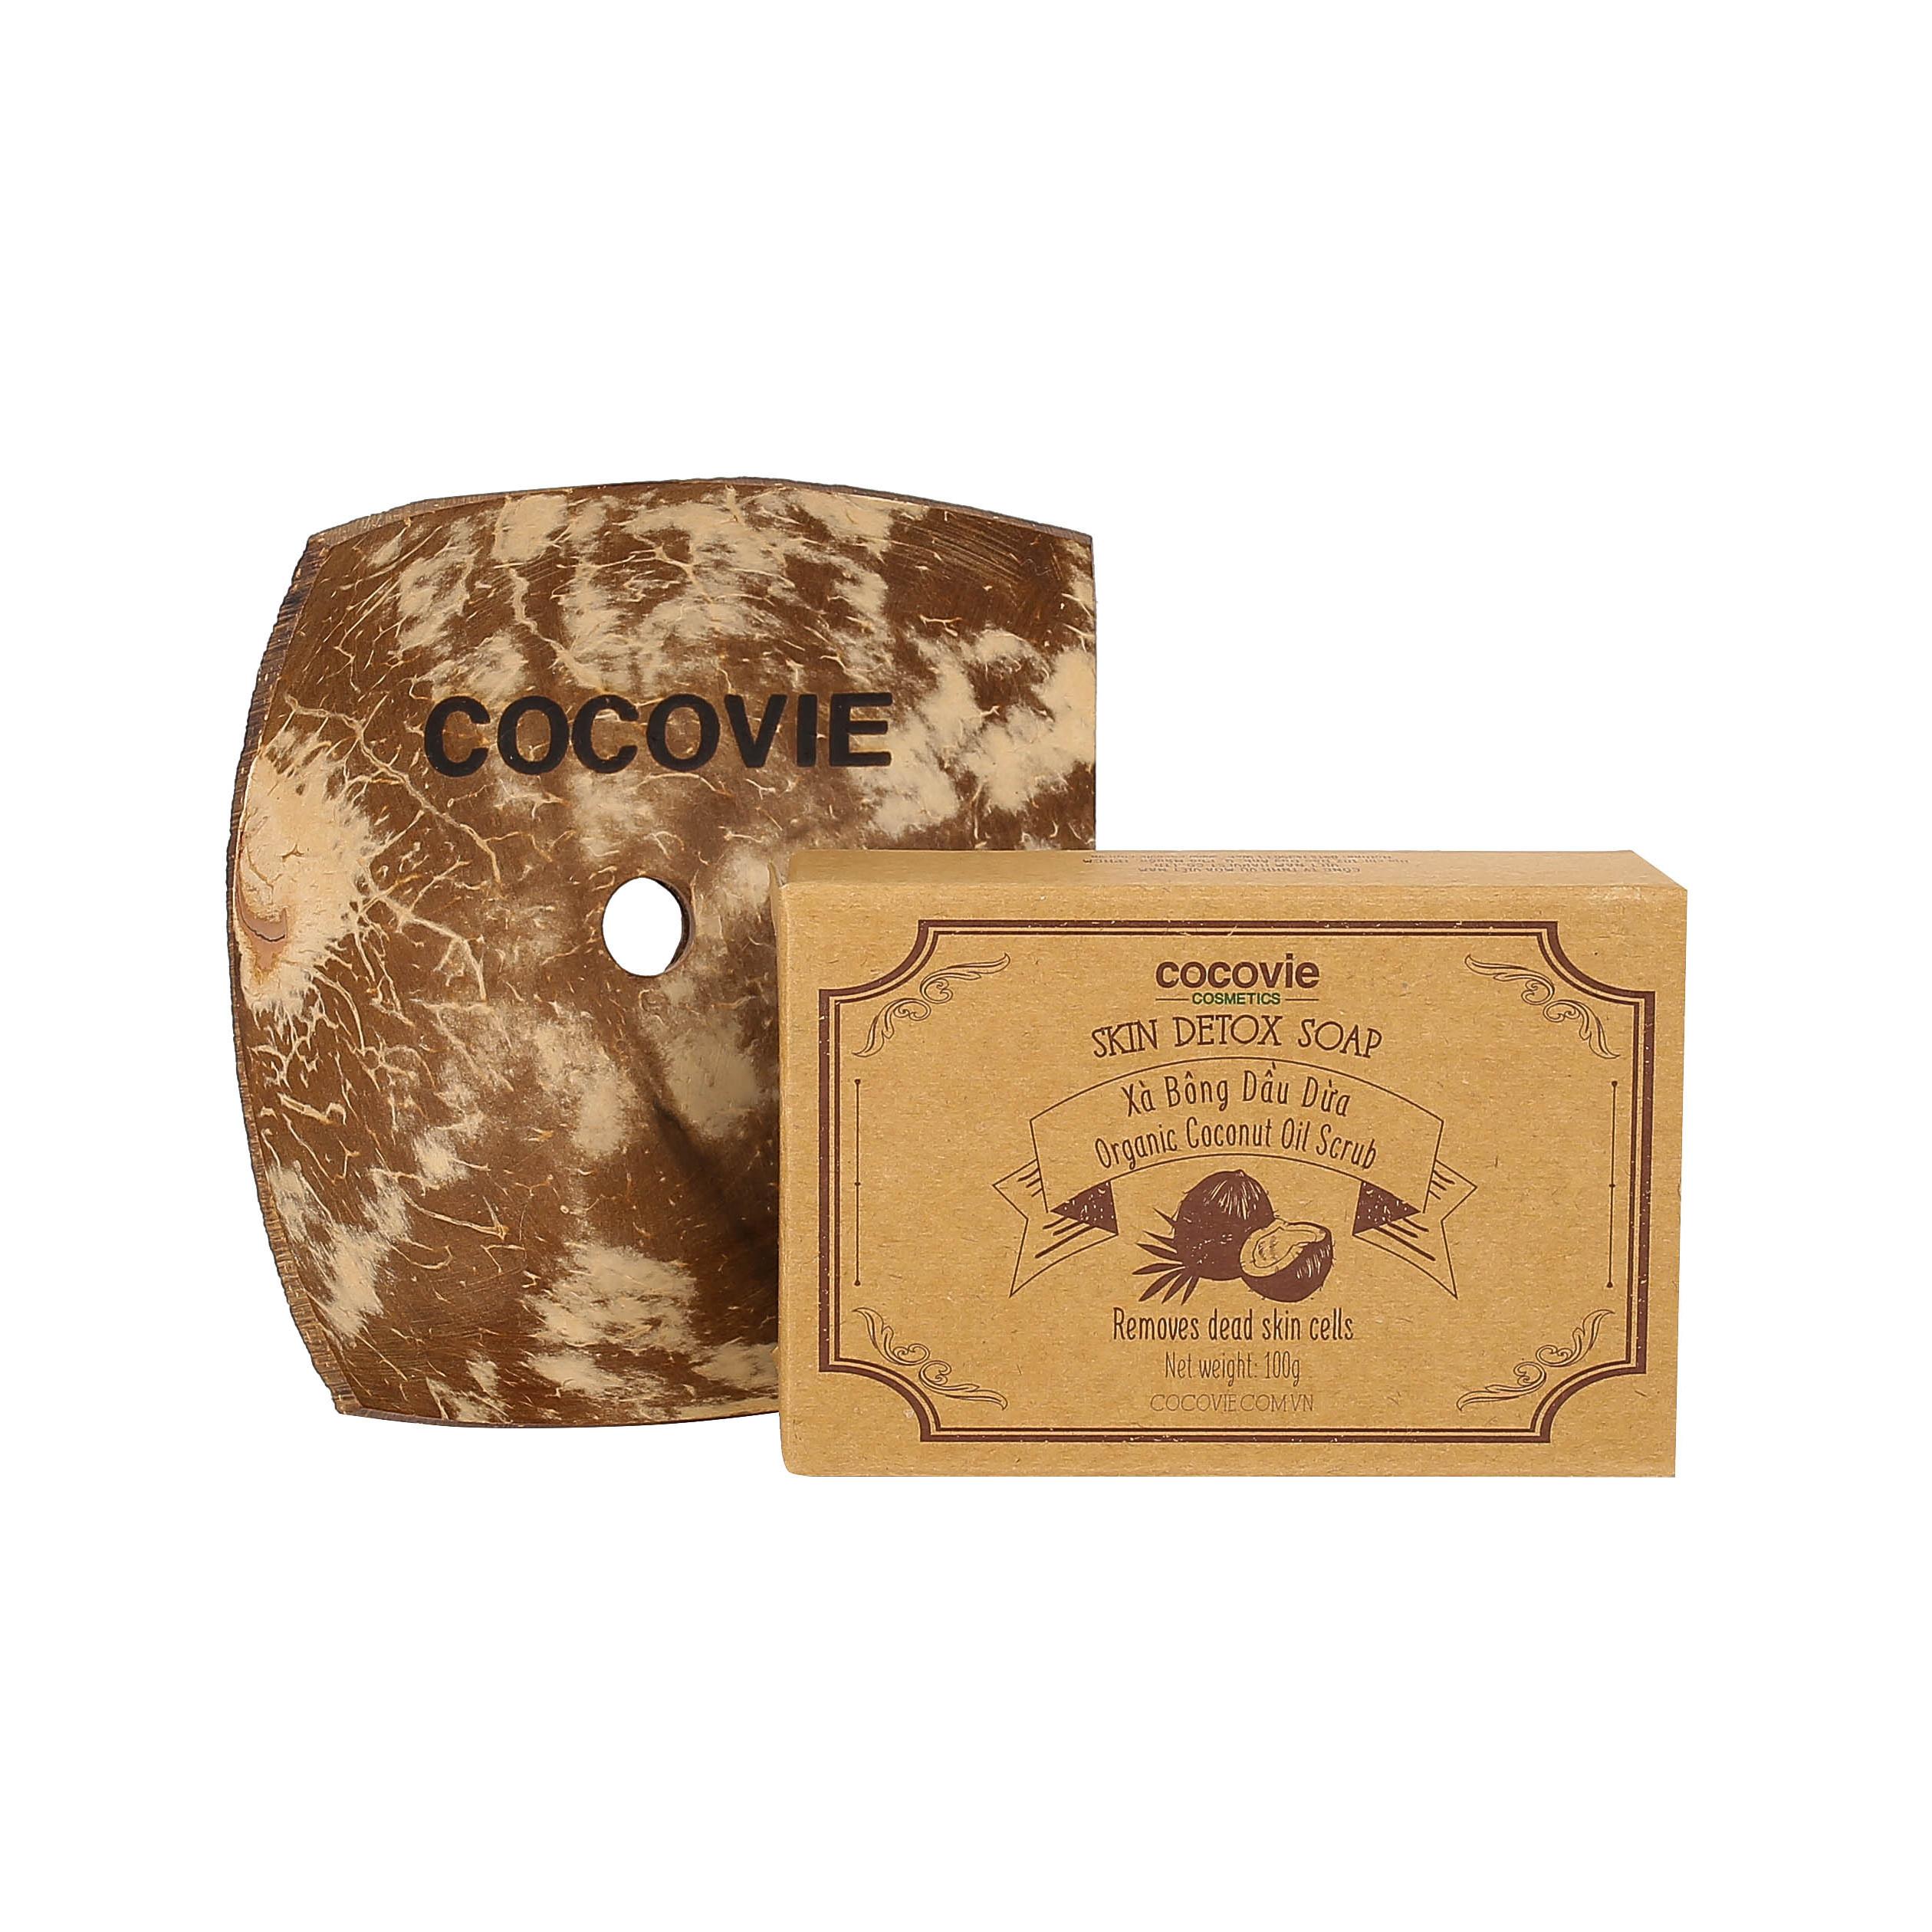 XÀ PHÒNG DẦU DỪA SKIN DETOX SOAP: ORGANIC COCONUT SCRUB